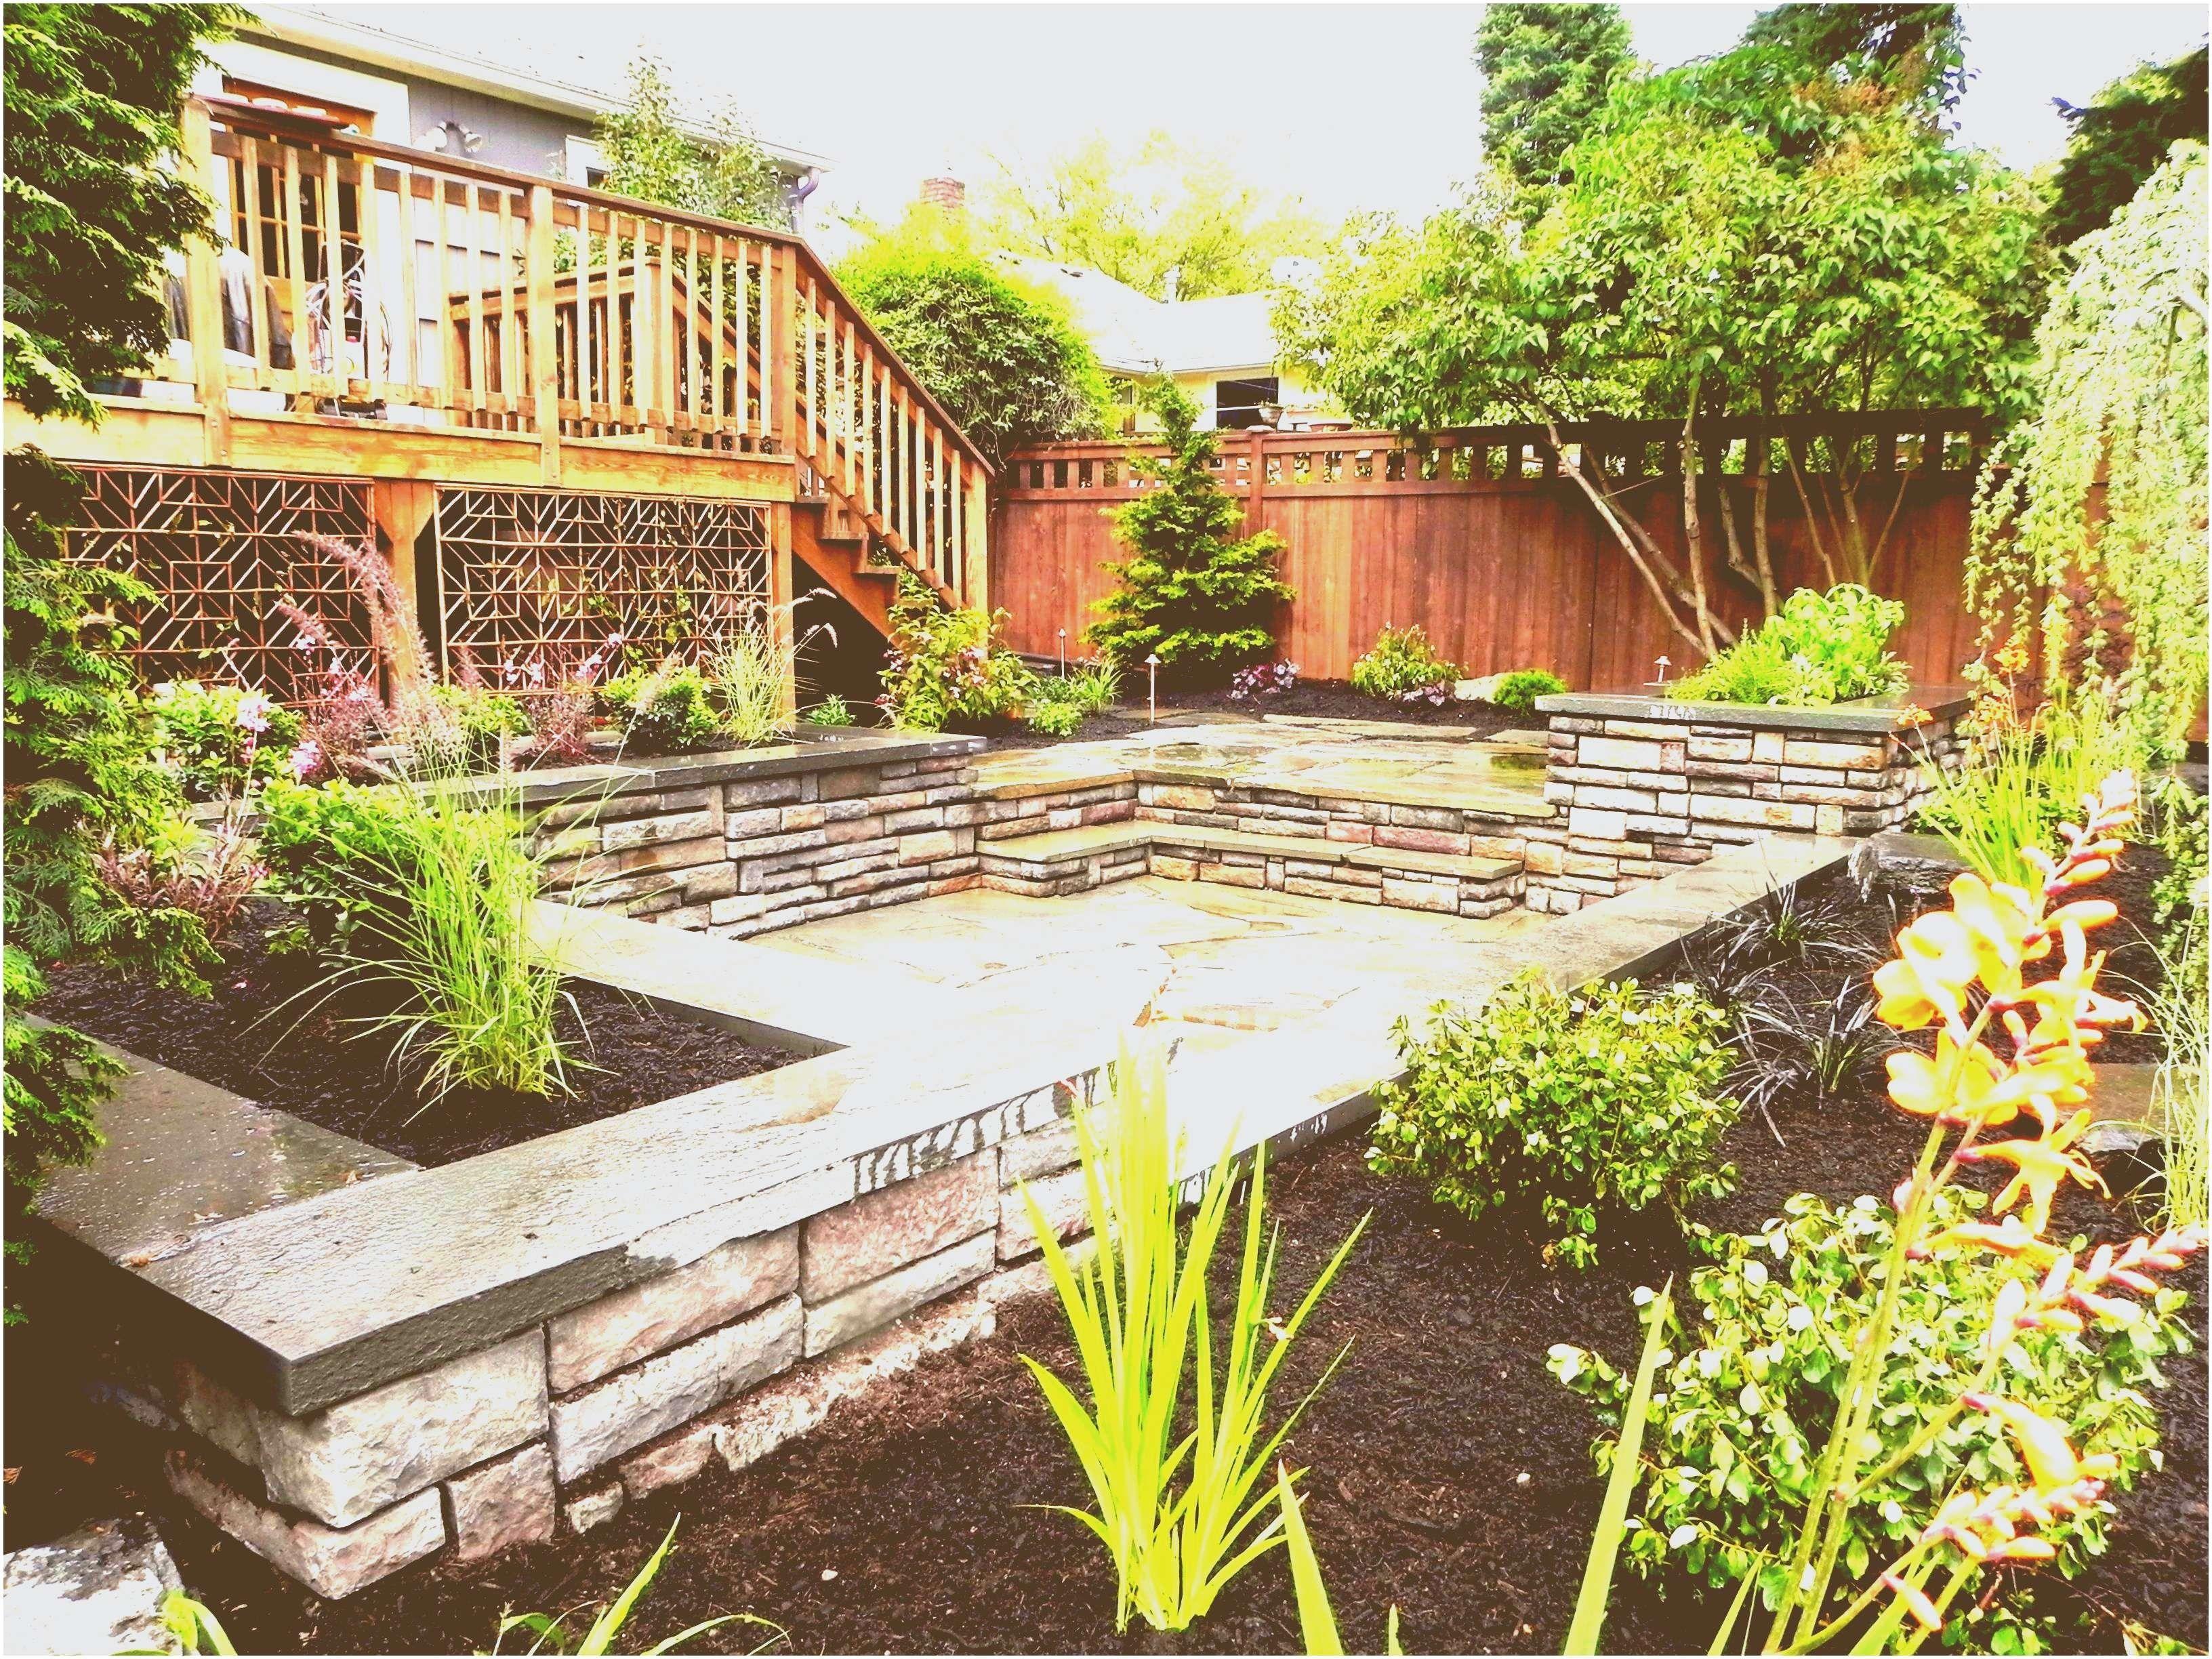 Formidable Backyard Ideas No Grass | Small yard ... on Cheap Backyard Ideas No Grass  id=44251